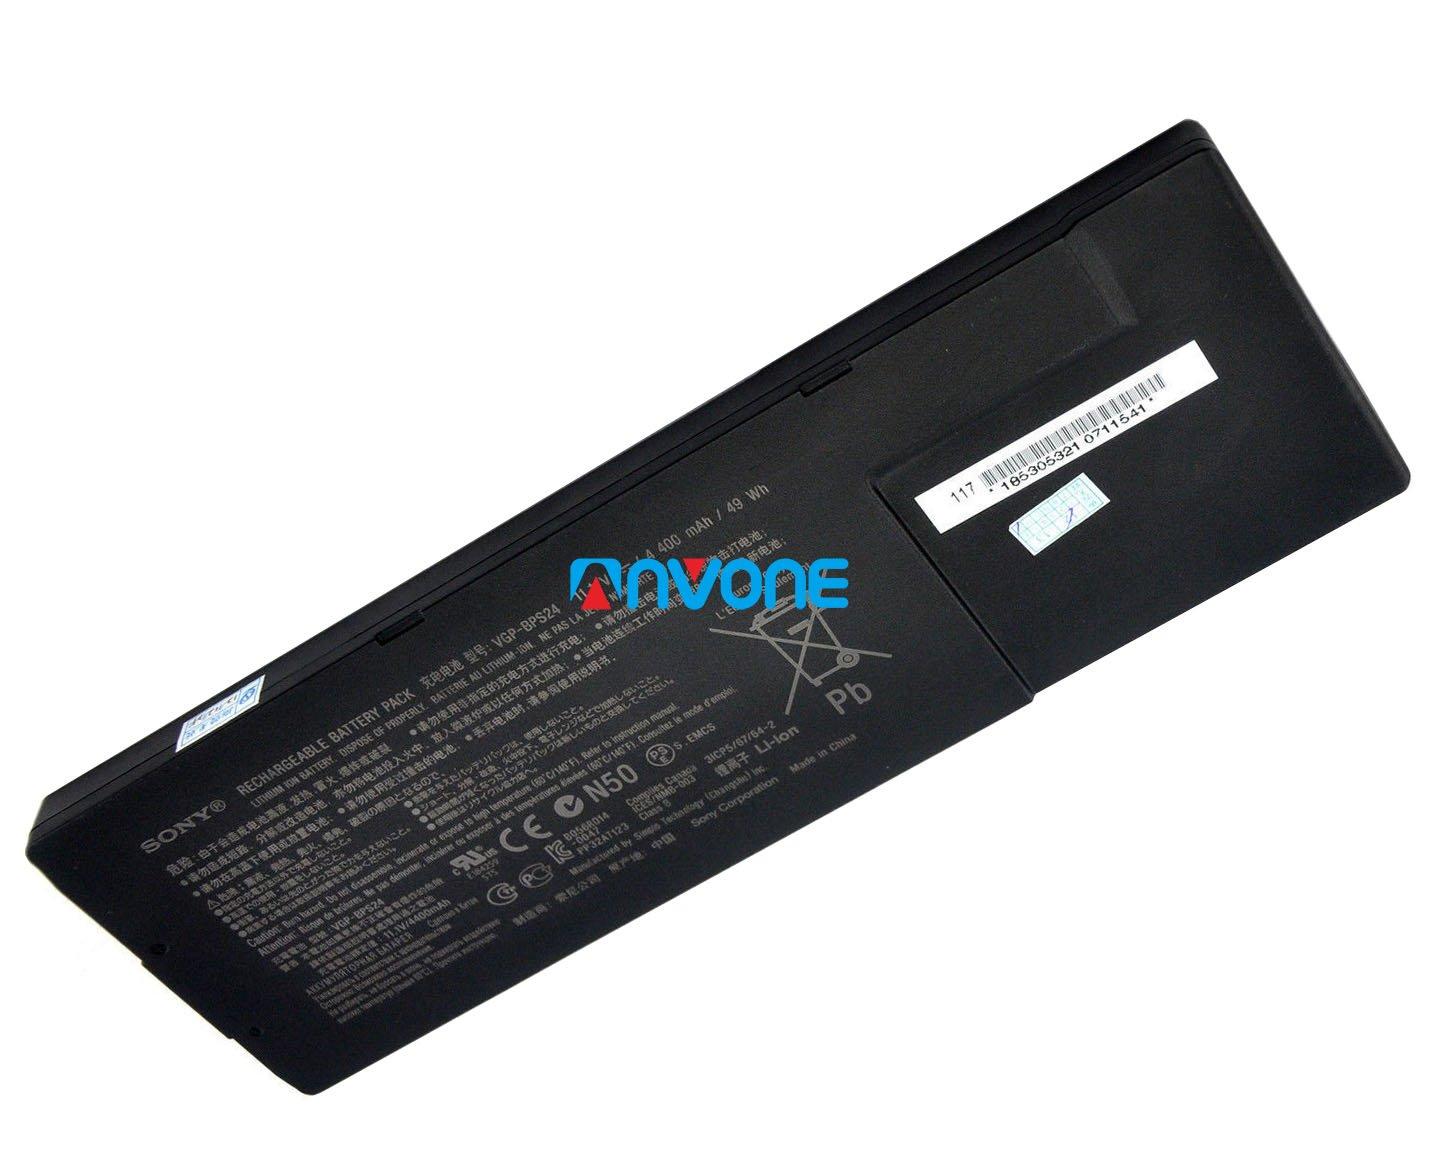 Genuine VGP-BPS24 Sony VAIO VPC-SA25GG/BI VPC-SA25GG/T VPC-SA25GH/T VPC-SA26GA/BI Battery